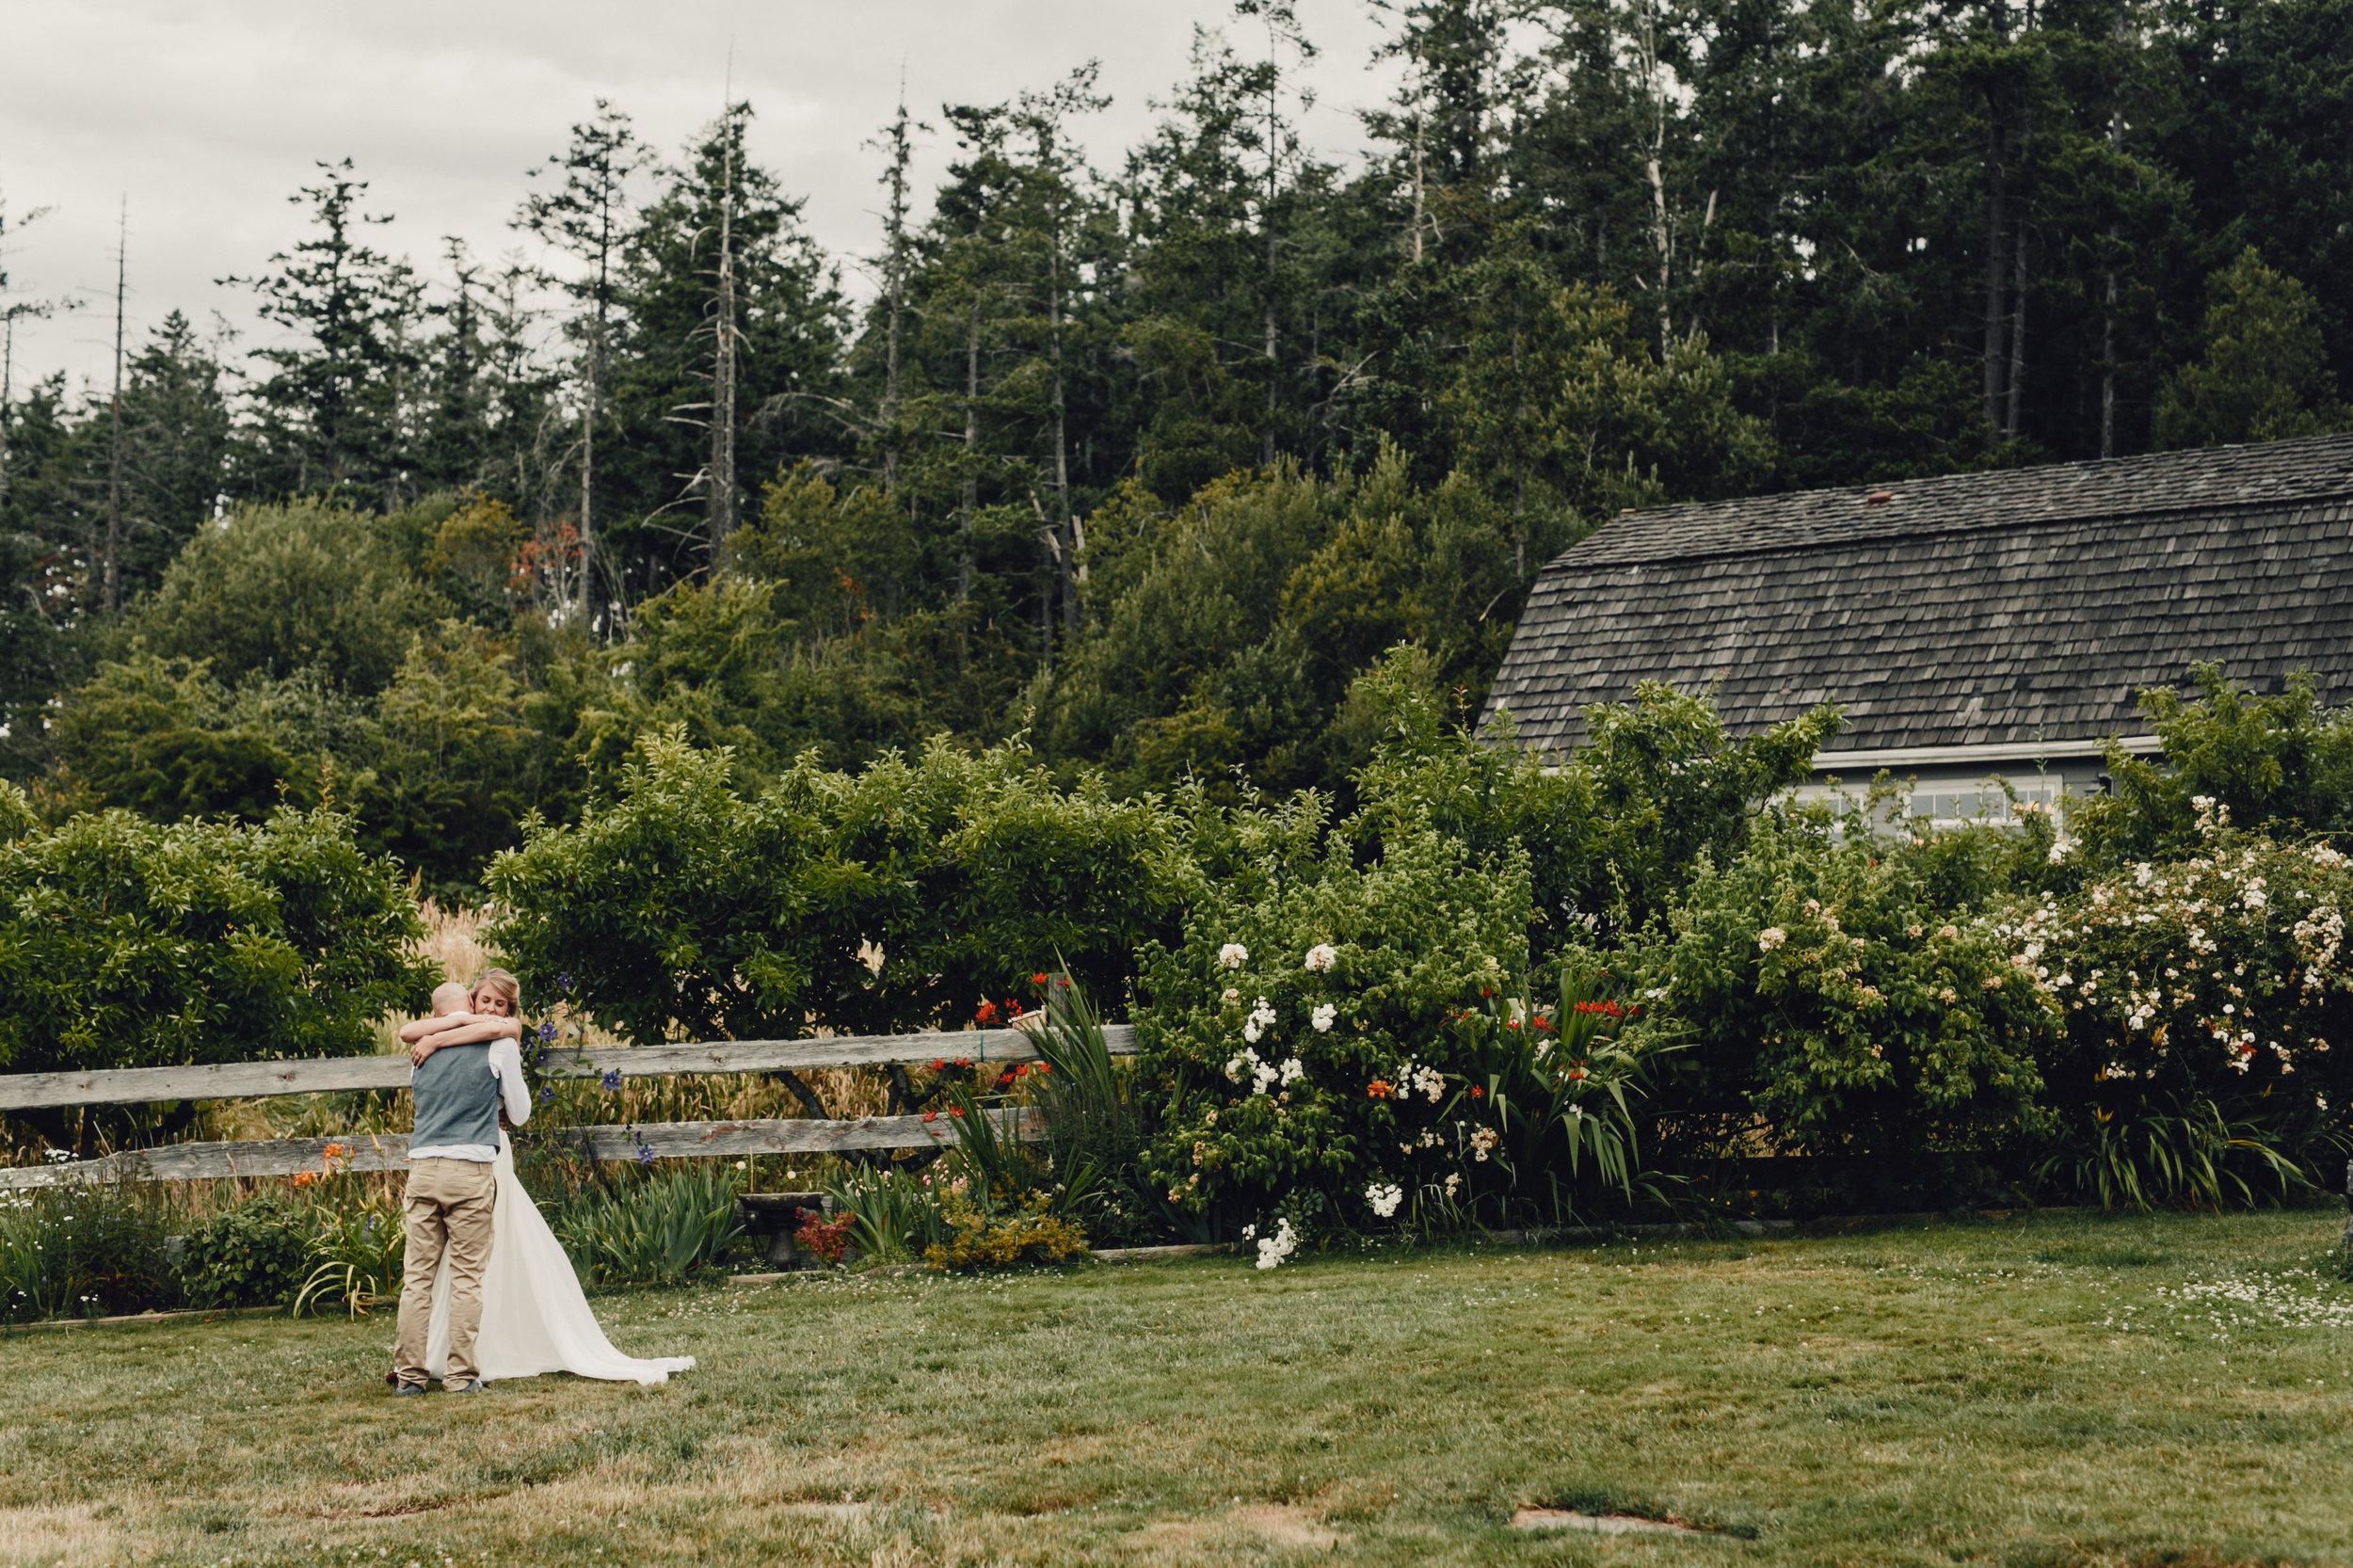 kildara-farms-wedding-photo-inspiration-0052